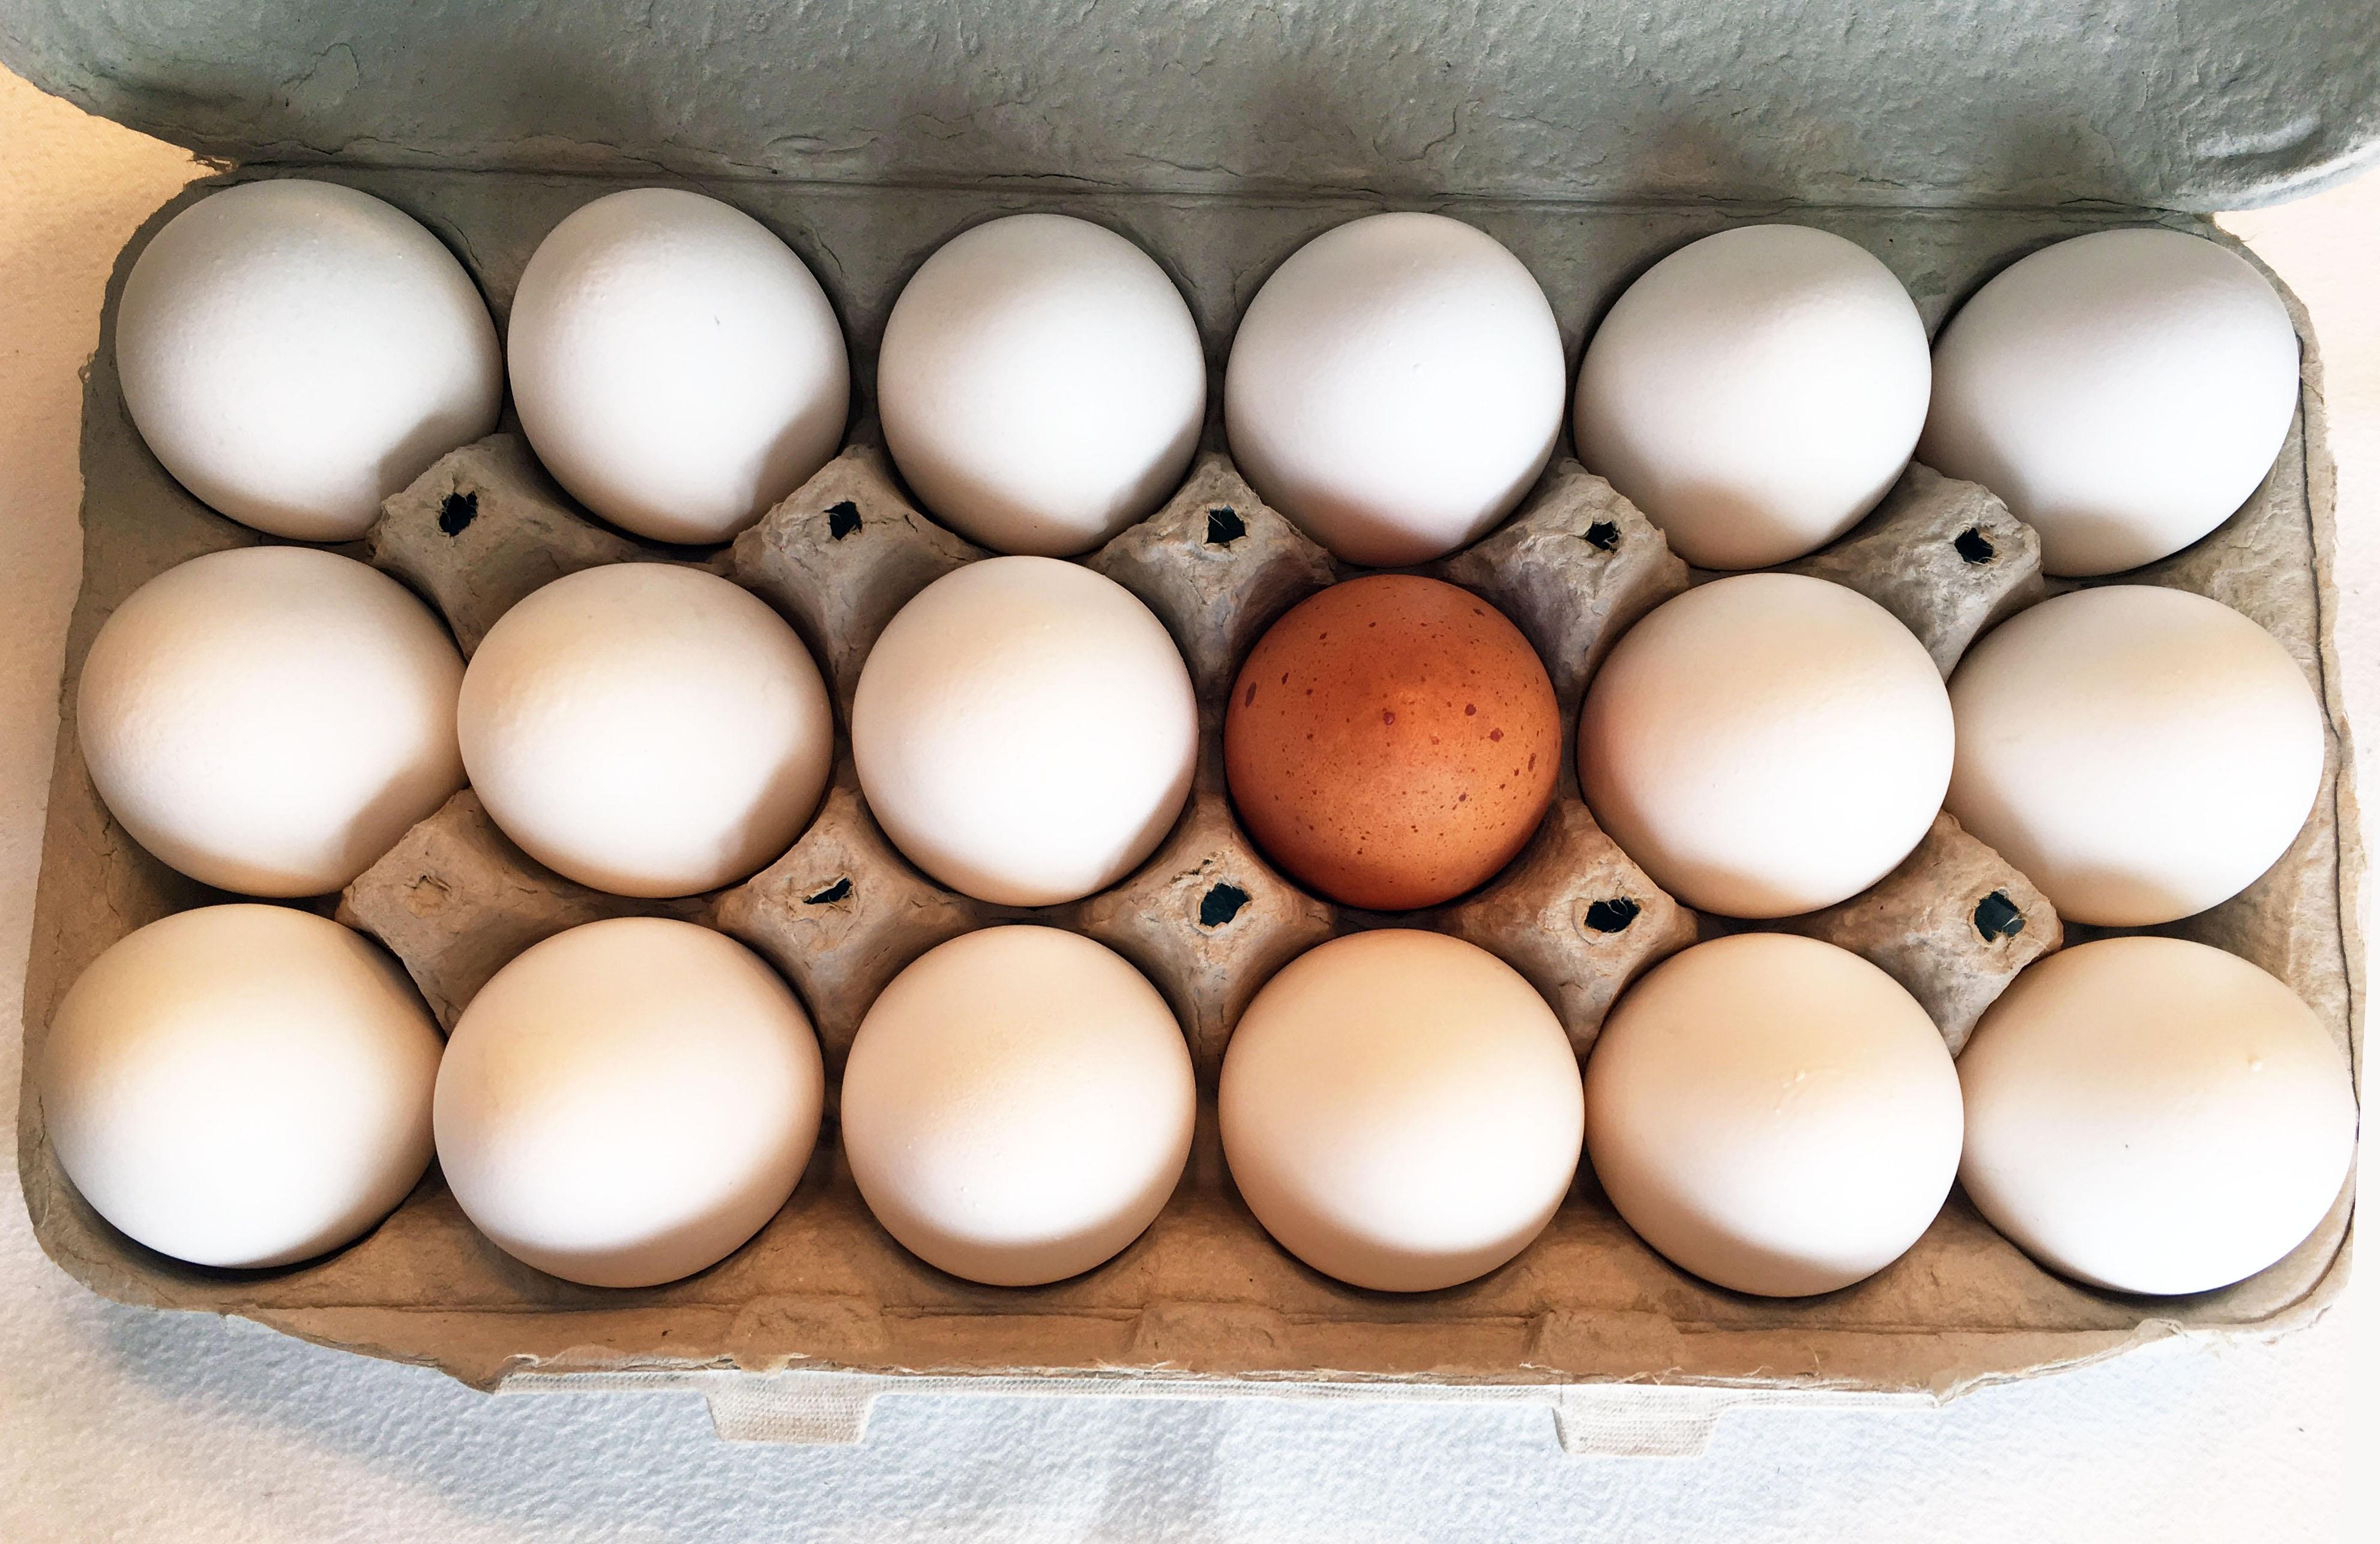 œufs contaminés